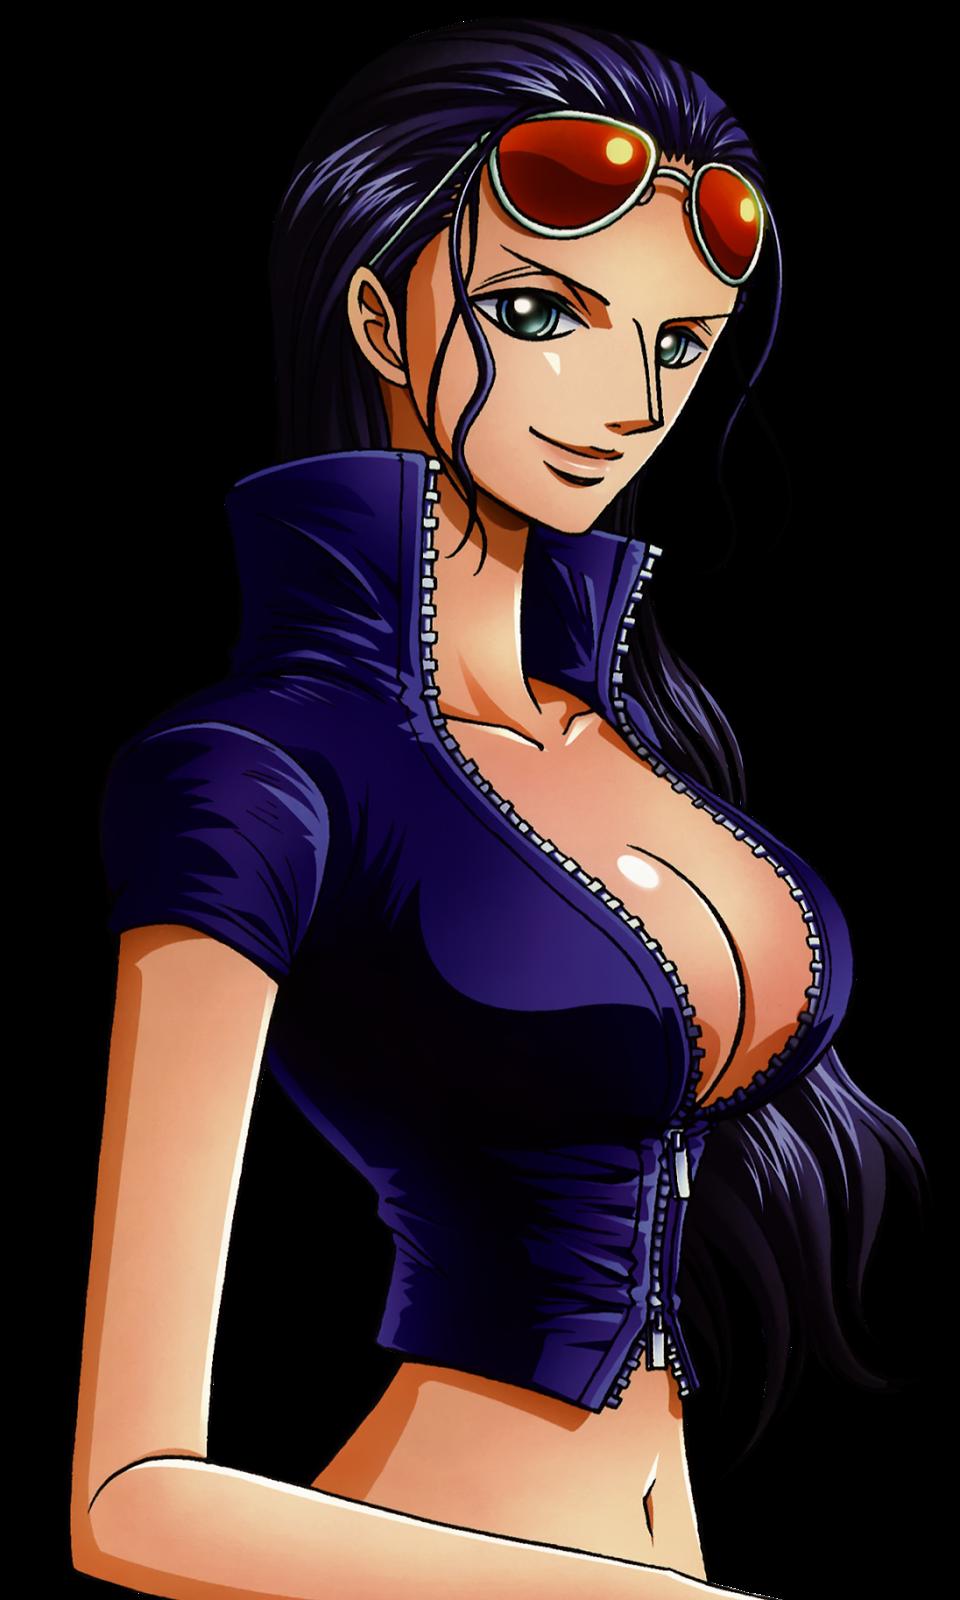 My Music: One Piece - Nico Robin